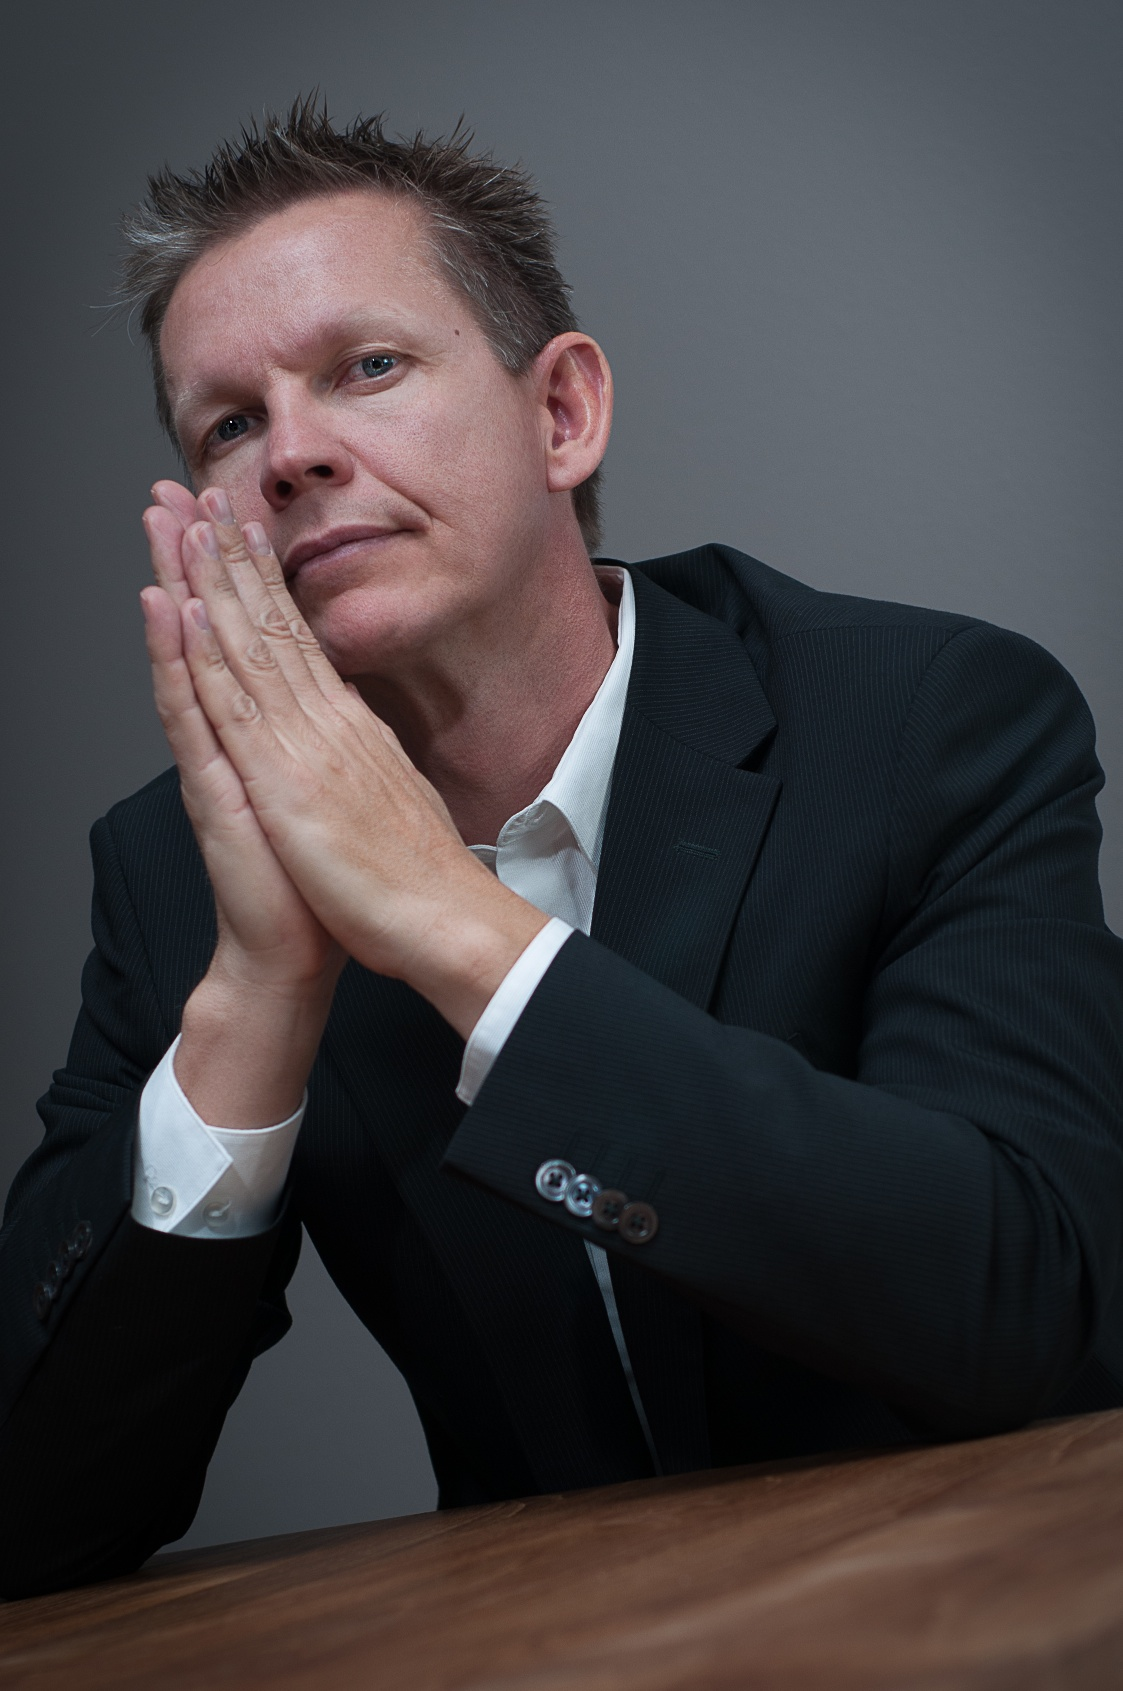 Mikkel Pitzner Portrait